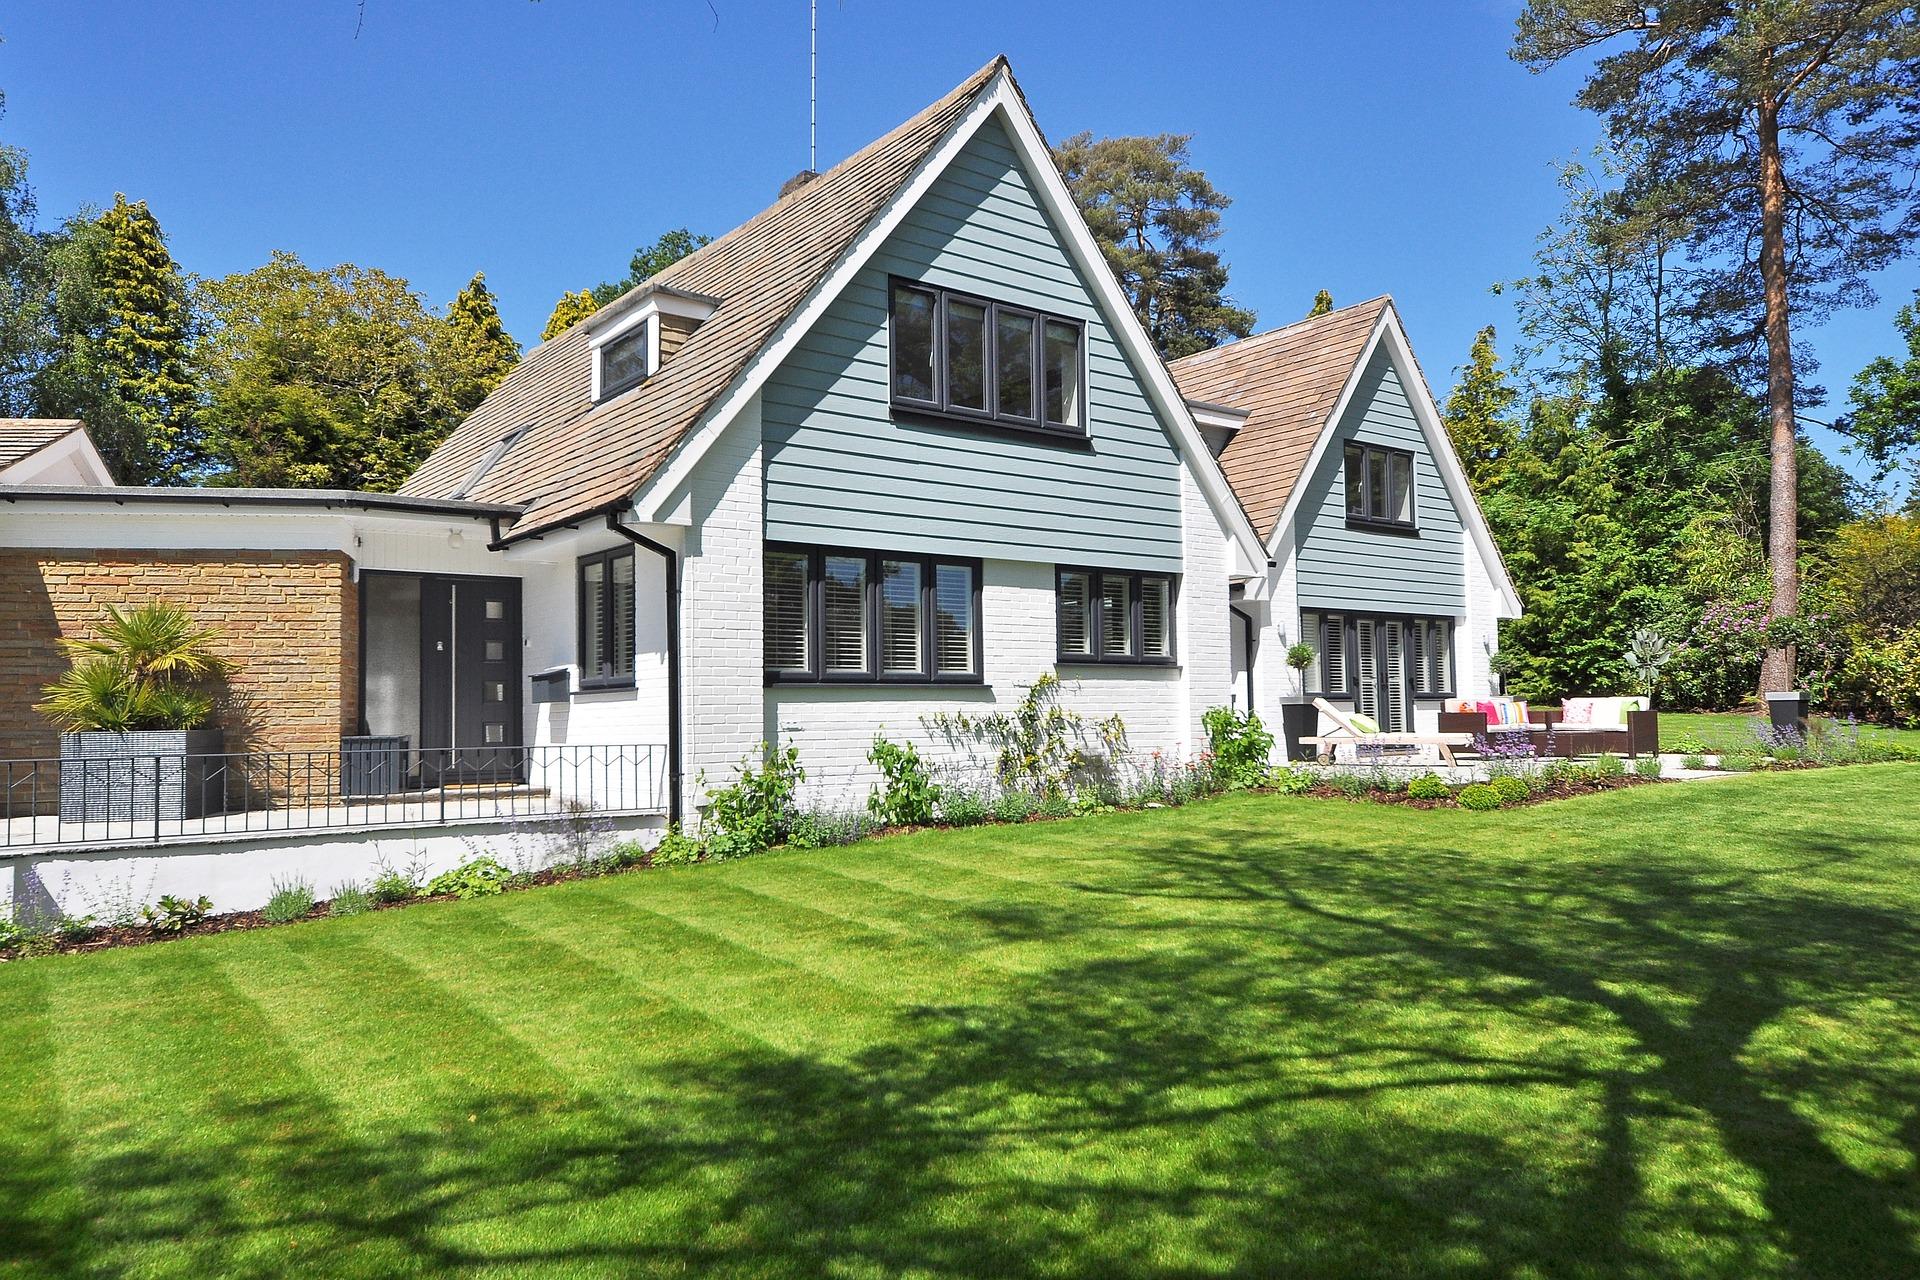 beautiful-home-2826052_1920.jpg